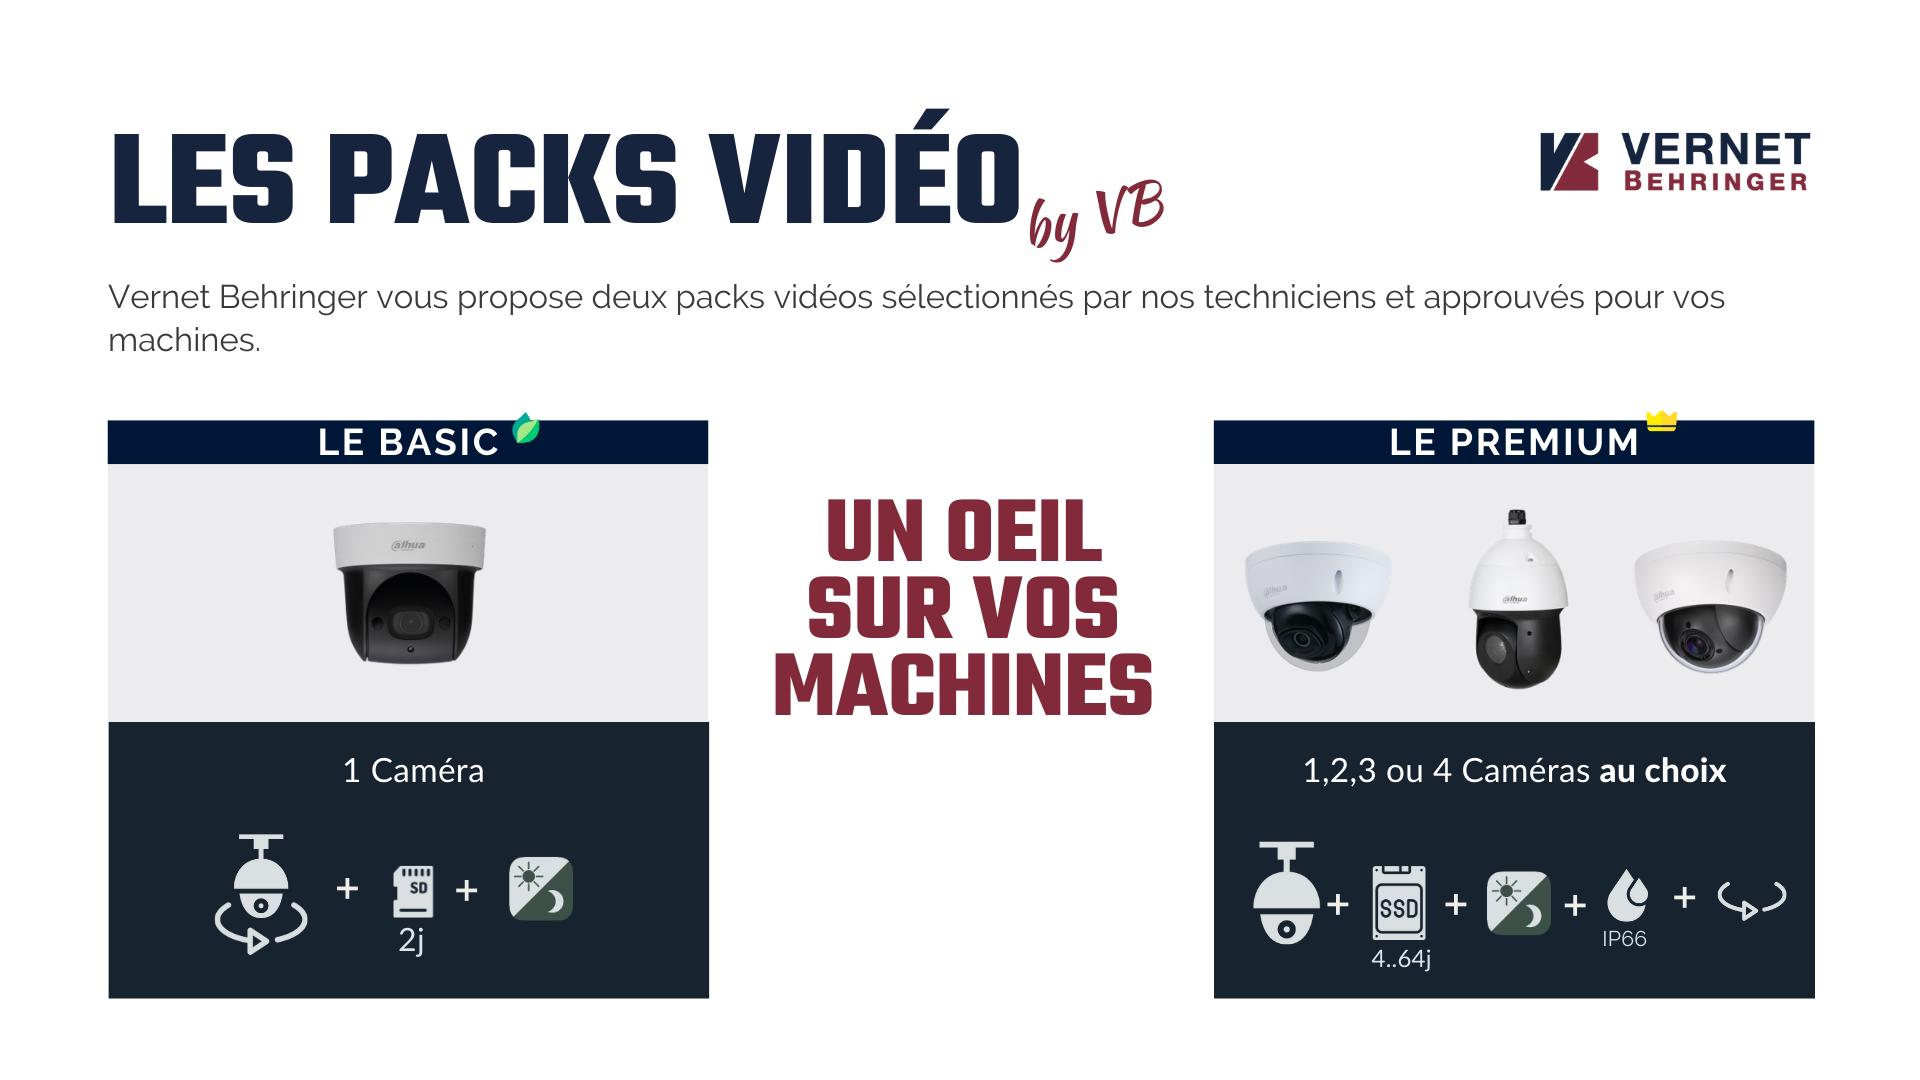 LES PACKS VIDEOS